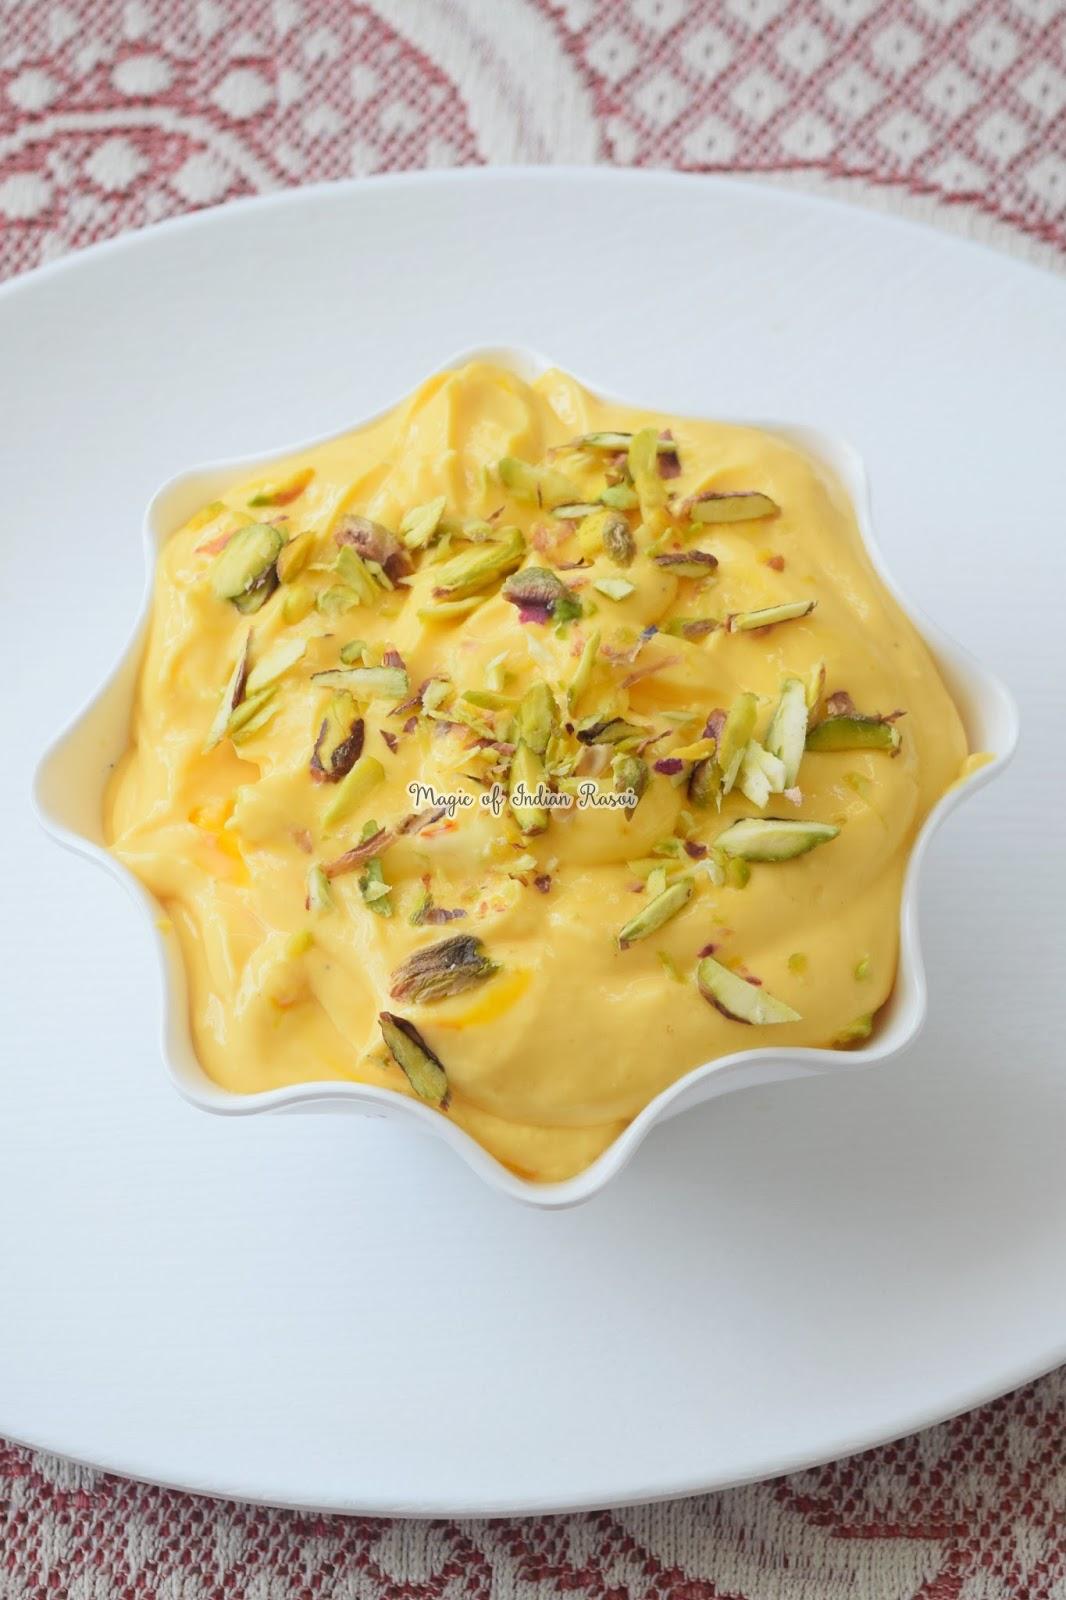 Mango Shrikhand - Amrakhand Recipe - मैंगो श्रीखन्ड- आम्रखंड रेसिपी - Priya R - Magic of Indian Rasoi